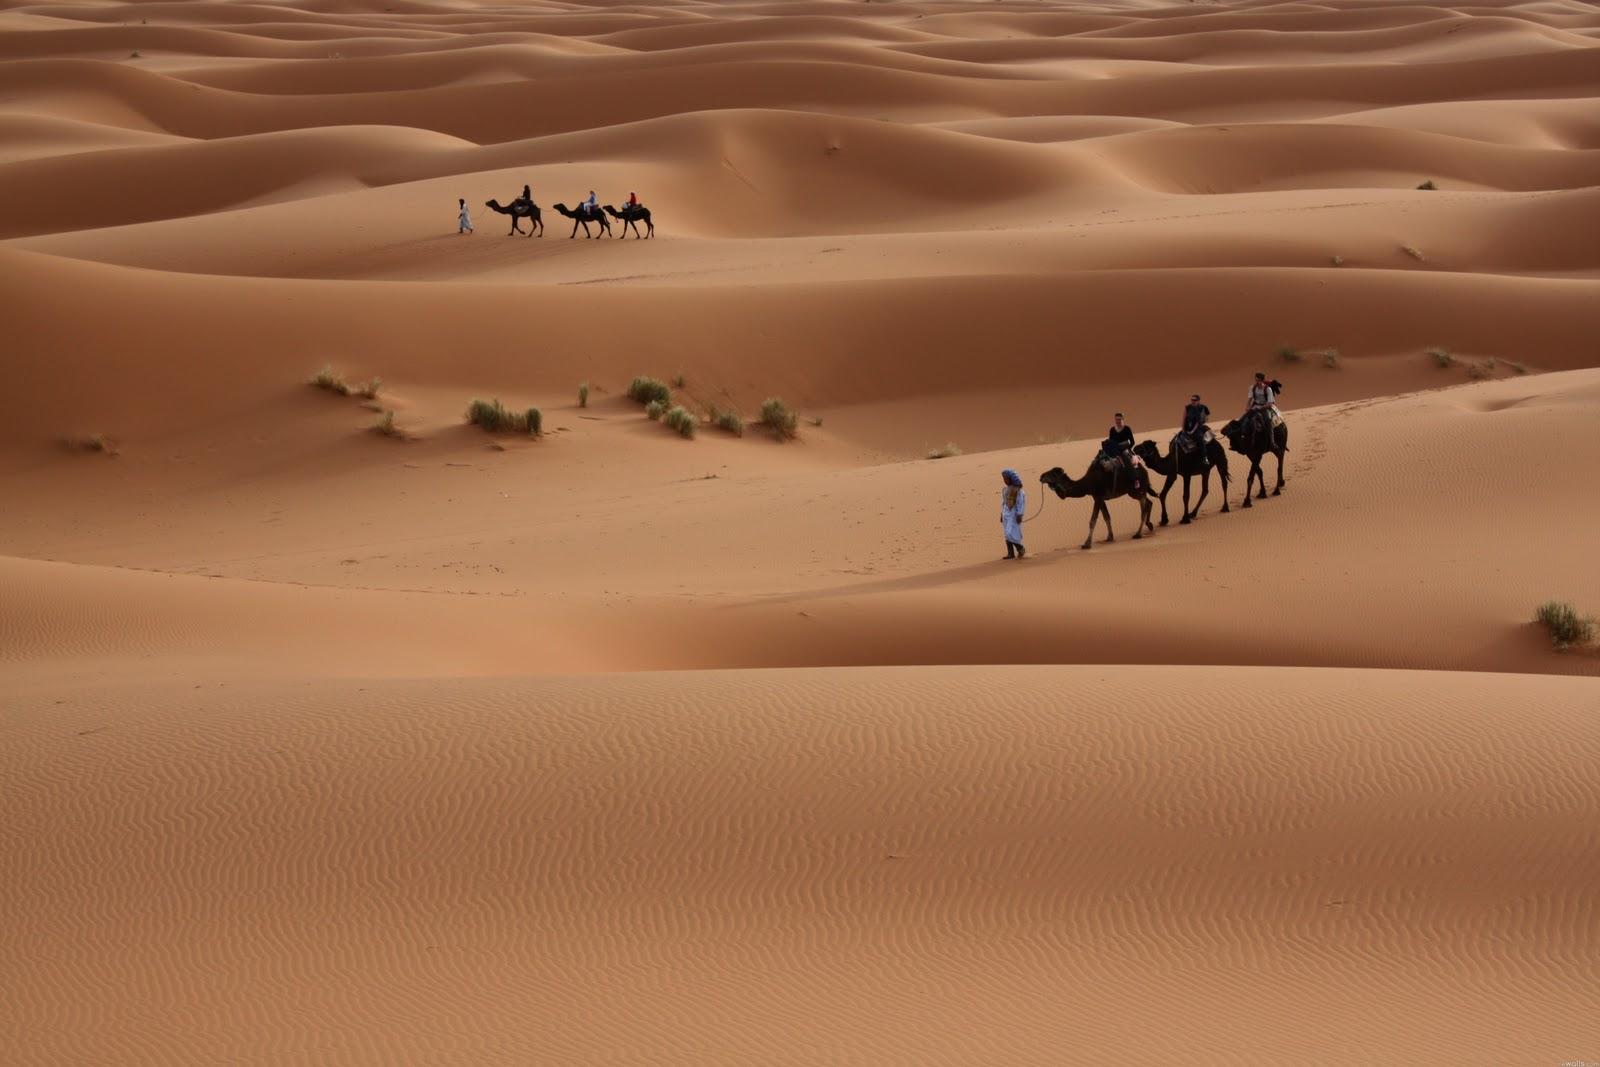 http://4.bp.blogspot.com/-2ZrpFKaE6pI/T-MCkapq5QI/AAAAAAAAGOM/nVorxD1_pbU/s1600/Middle-East-Desert-HD-Wallpaper.jpg